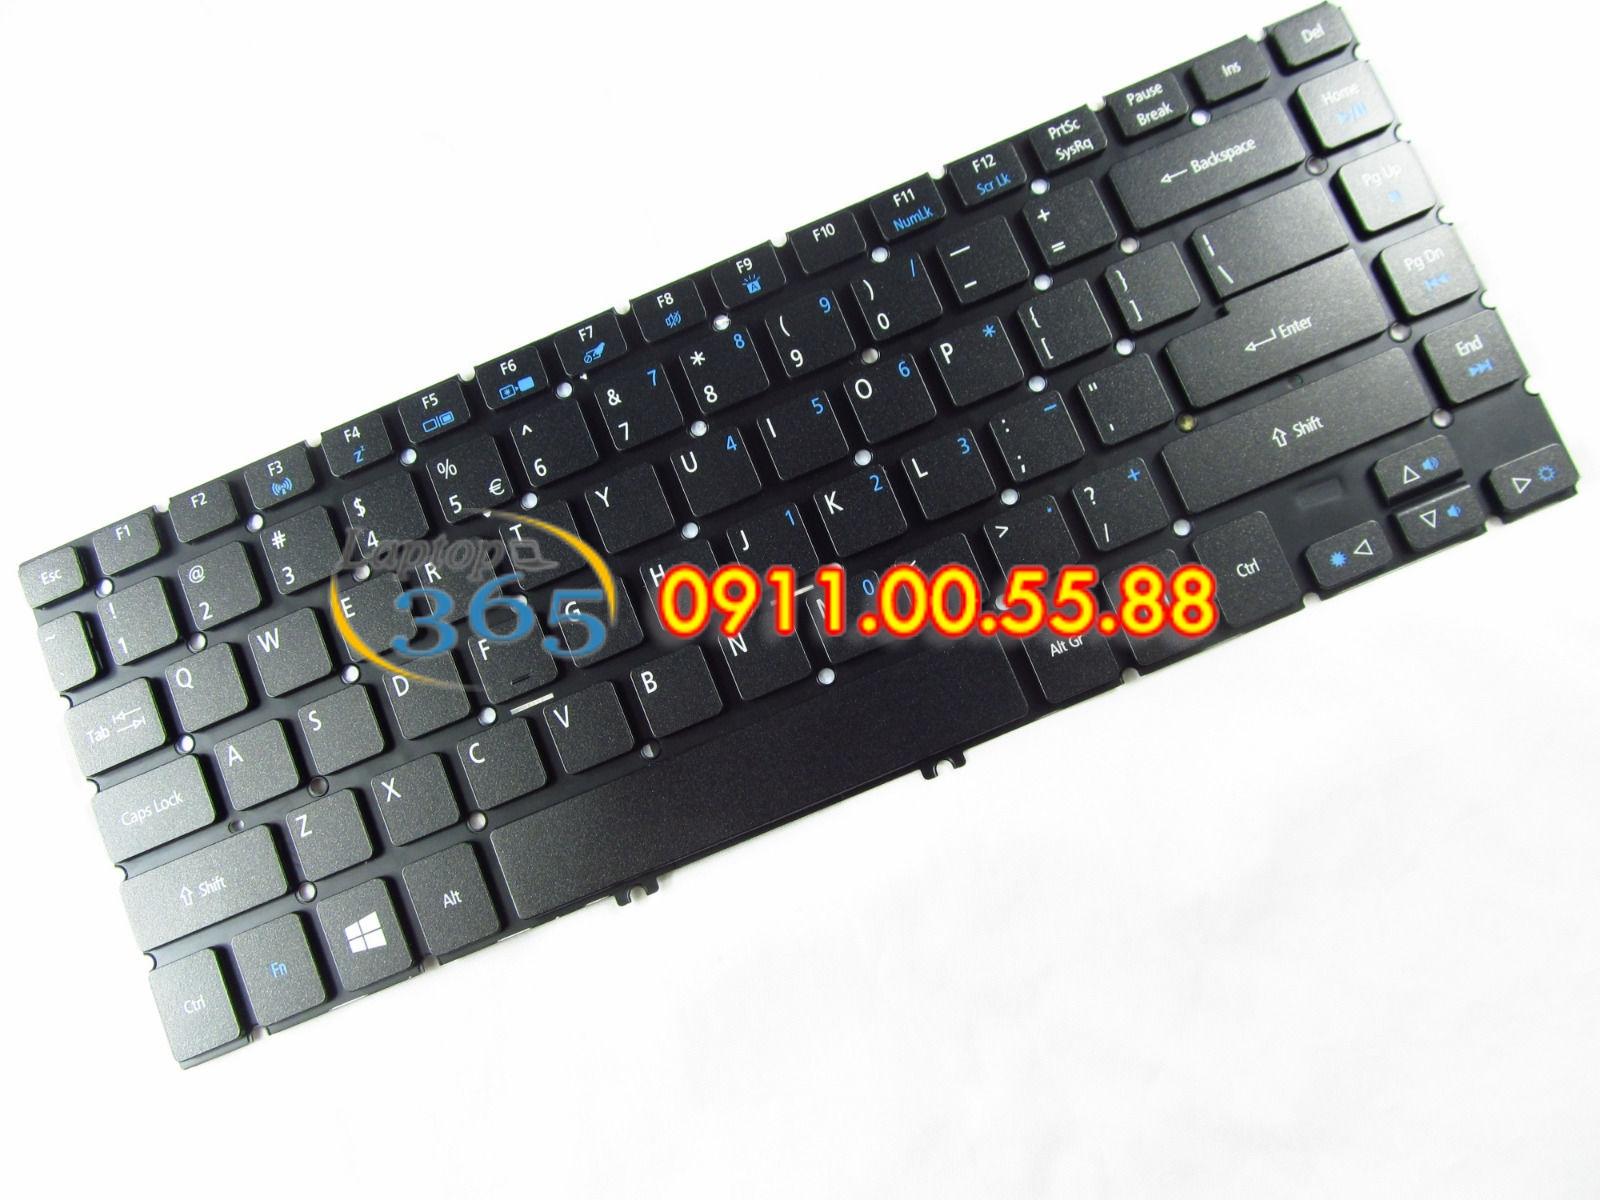 Bàn Phím Laptop Acer Aspire V5-551G